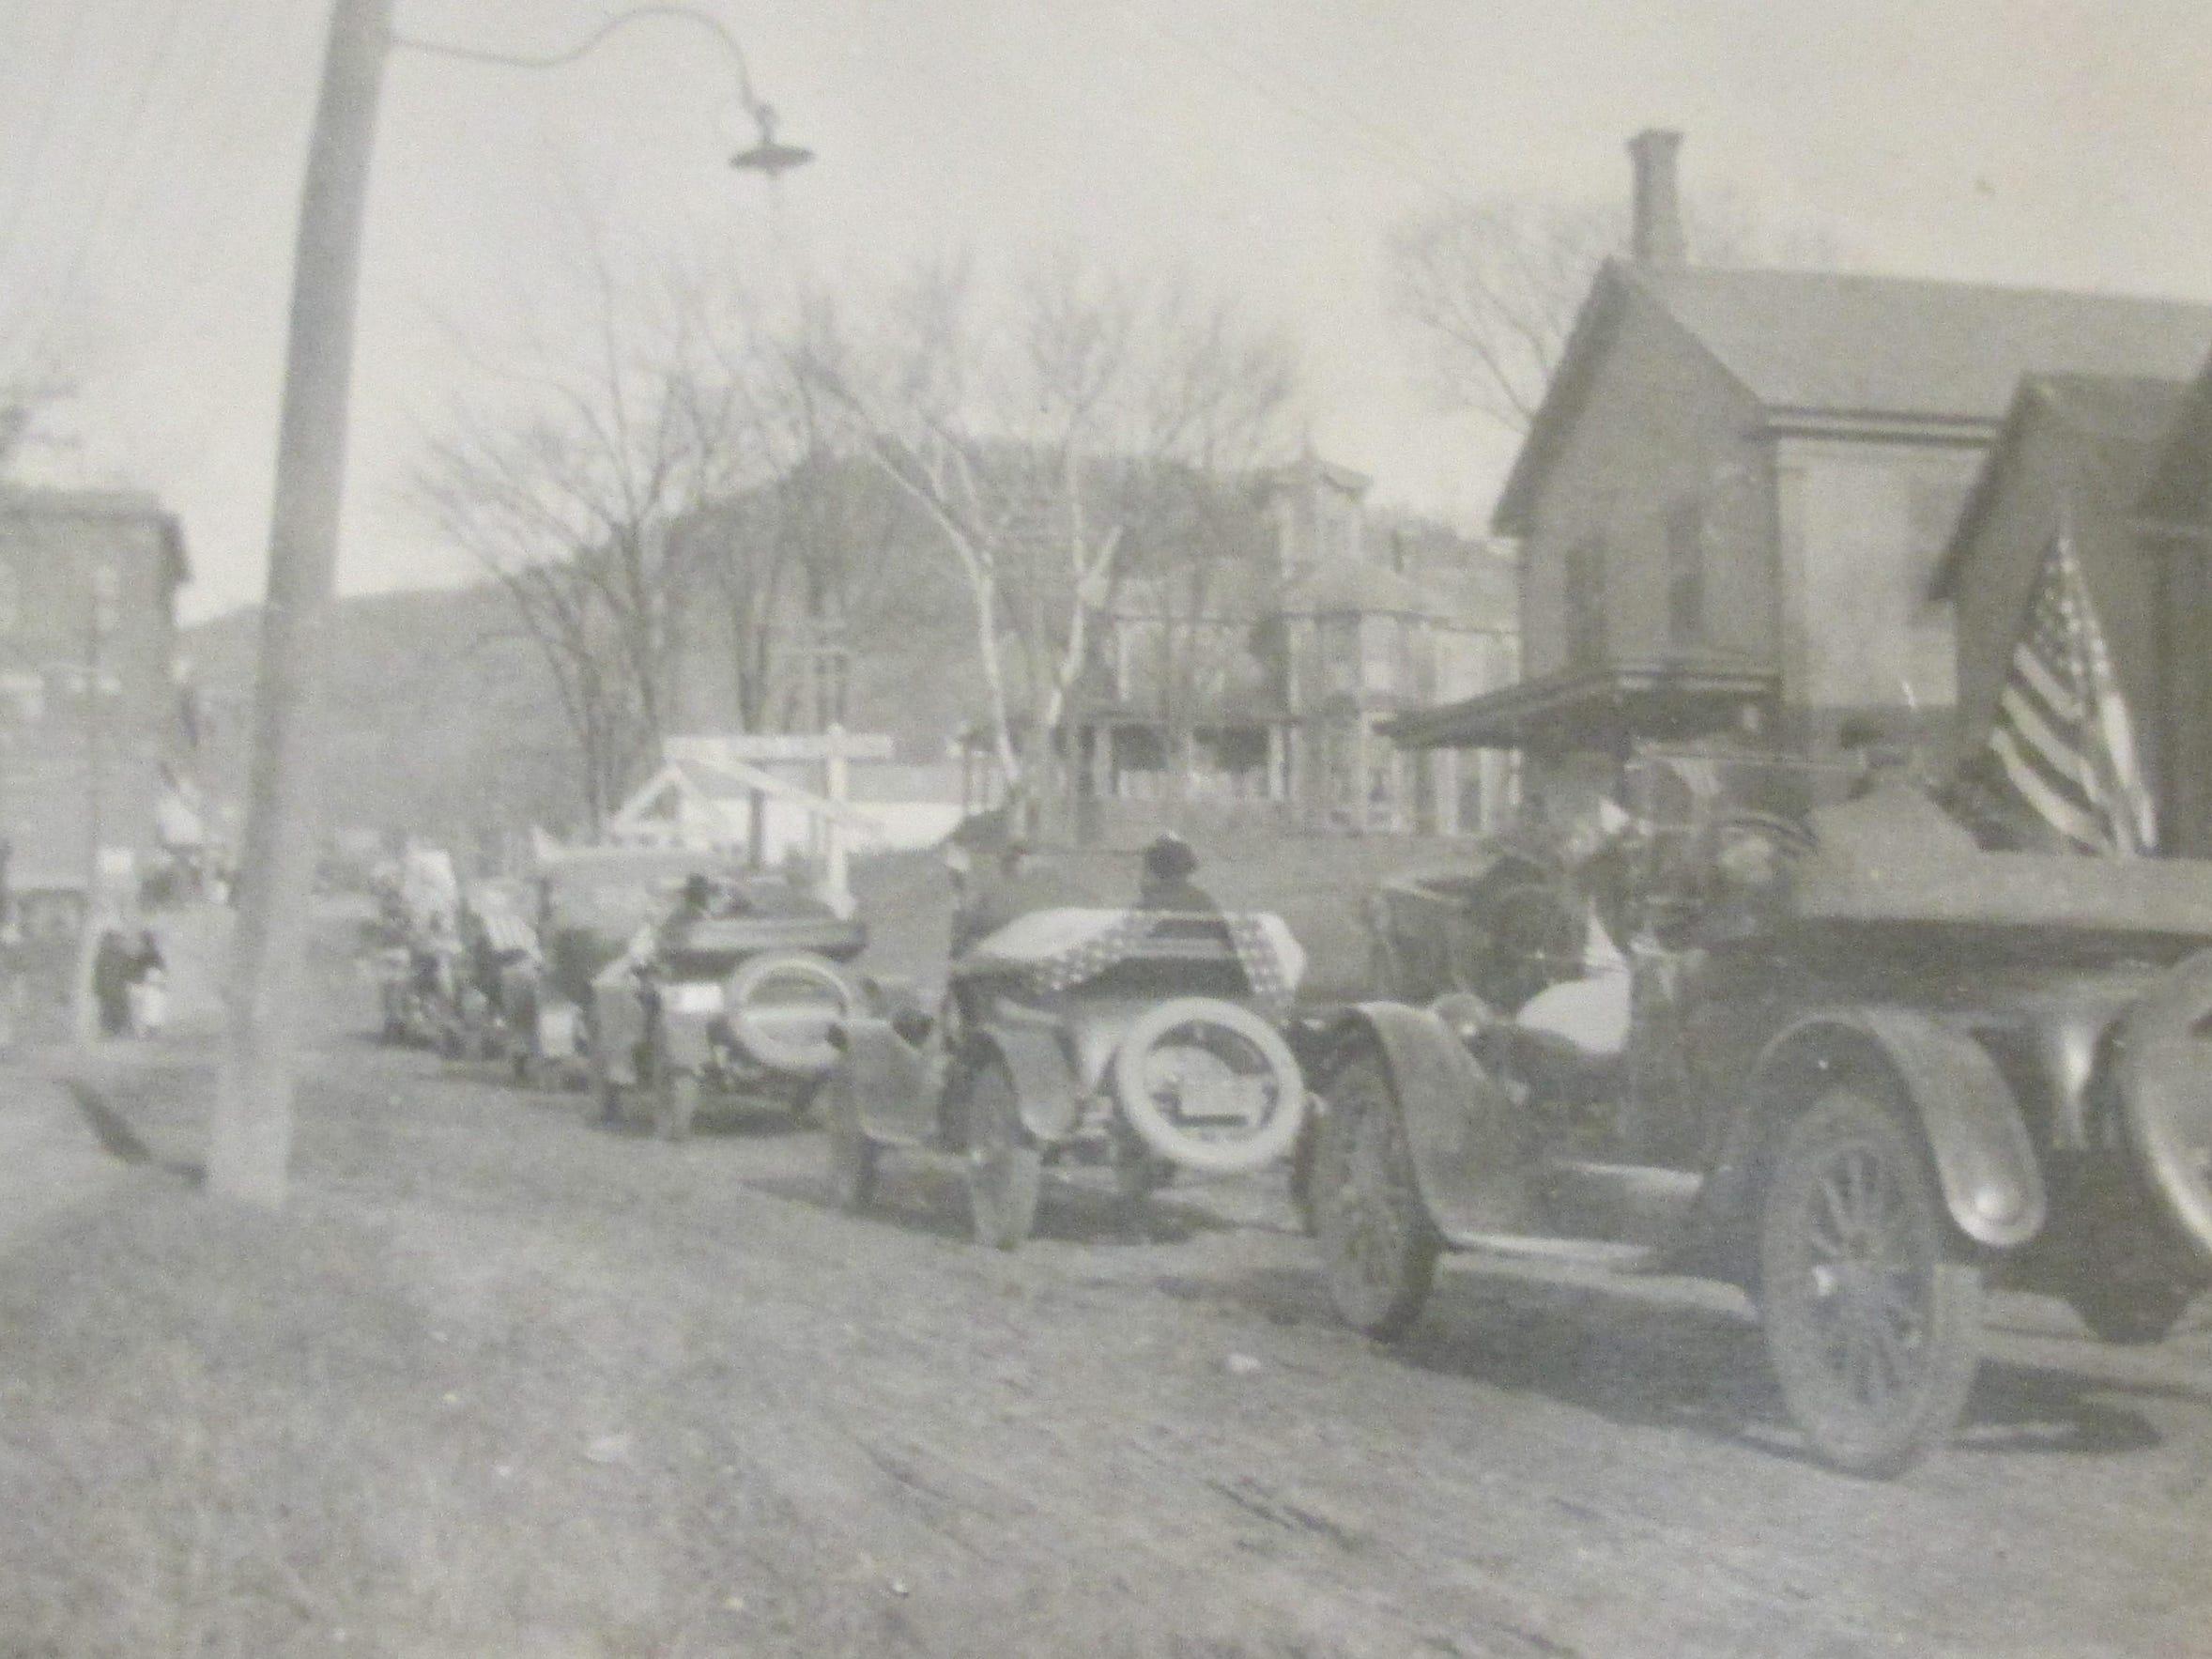 3. Armistice Day - November 11, 1918